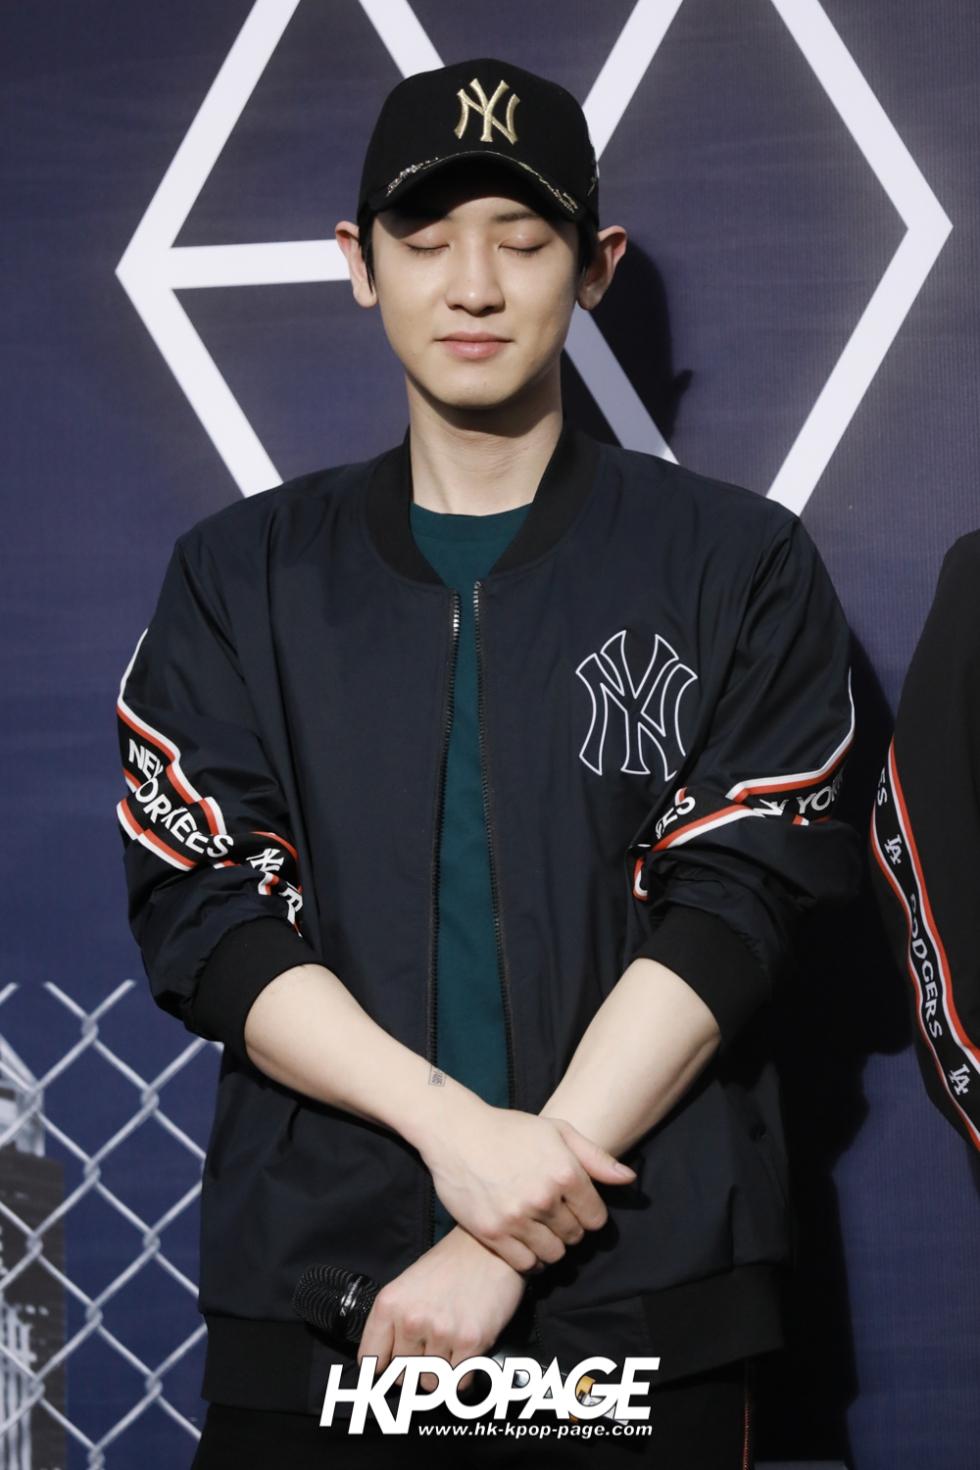 [HK.KPOP.PAGE] 180323_EXO_Chanyeol Kai Sehun_MLB Event_17